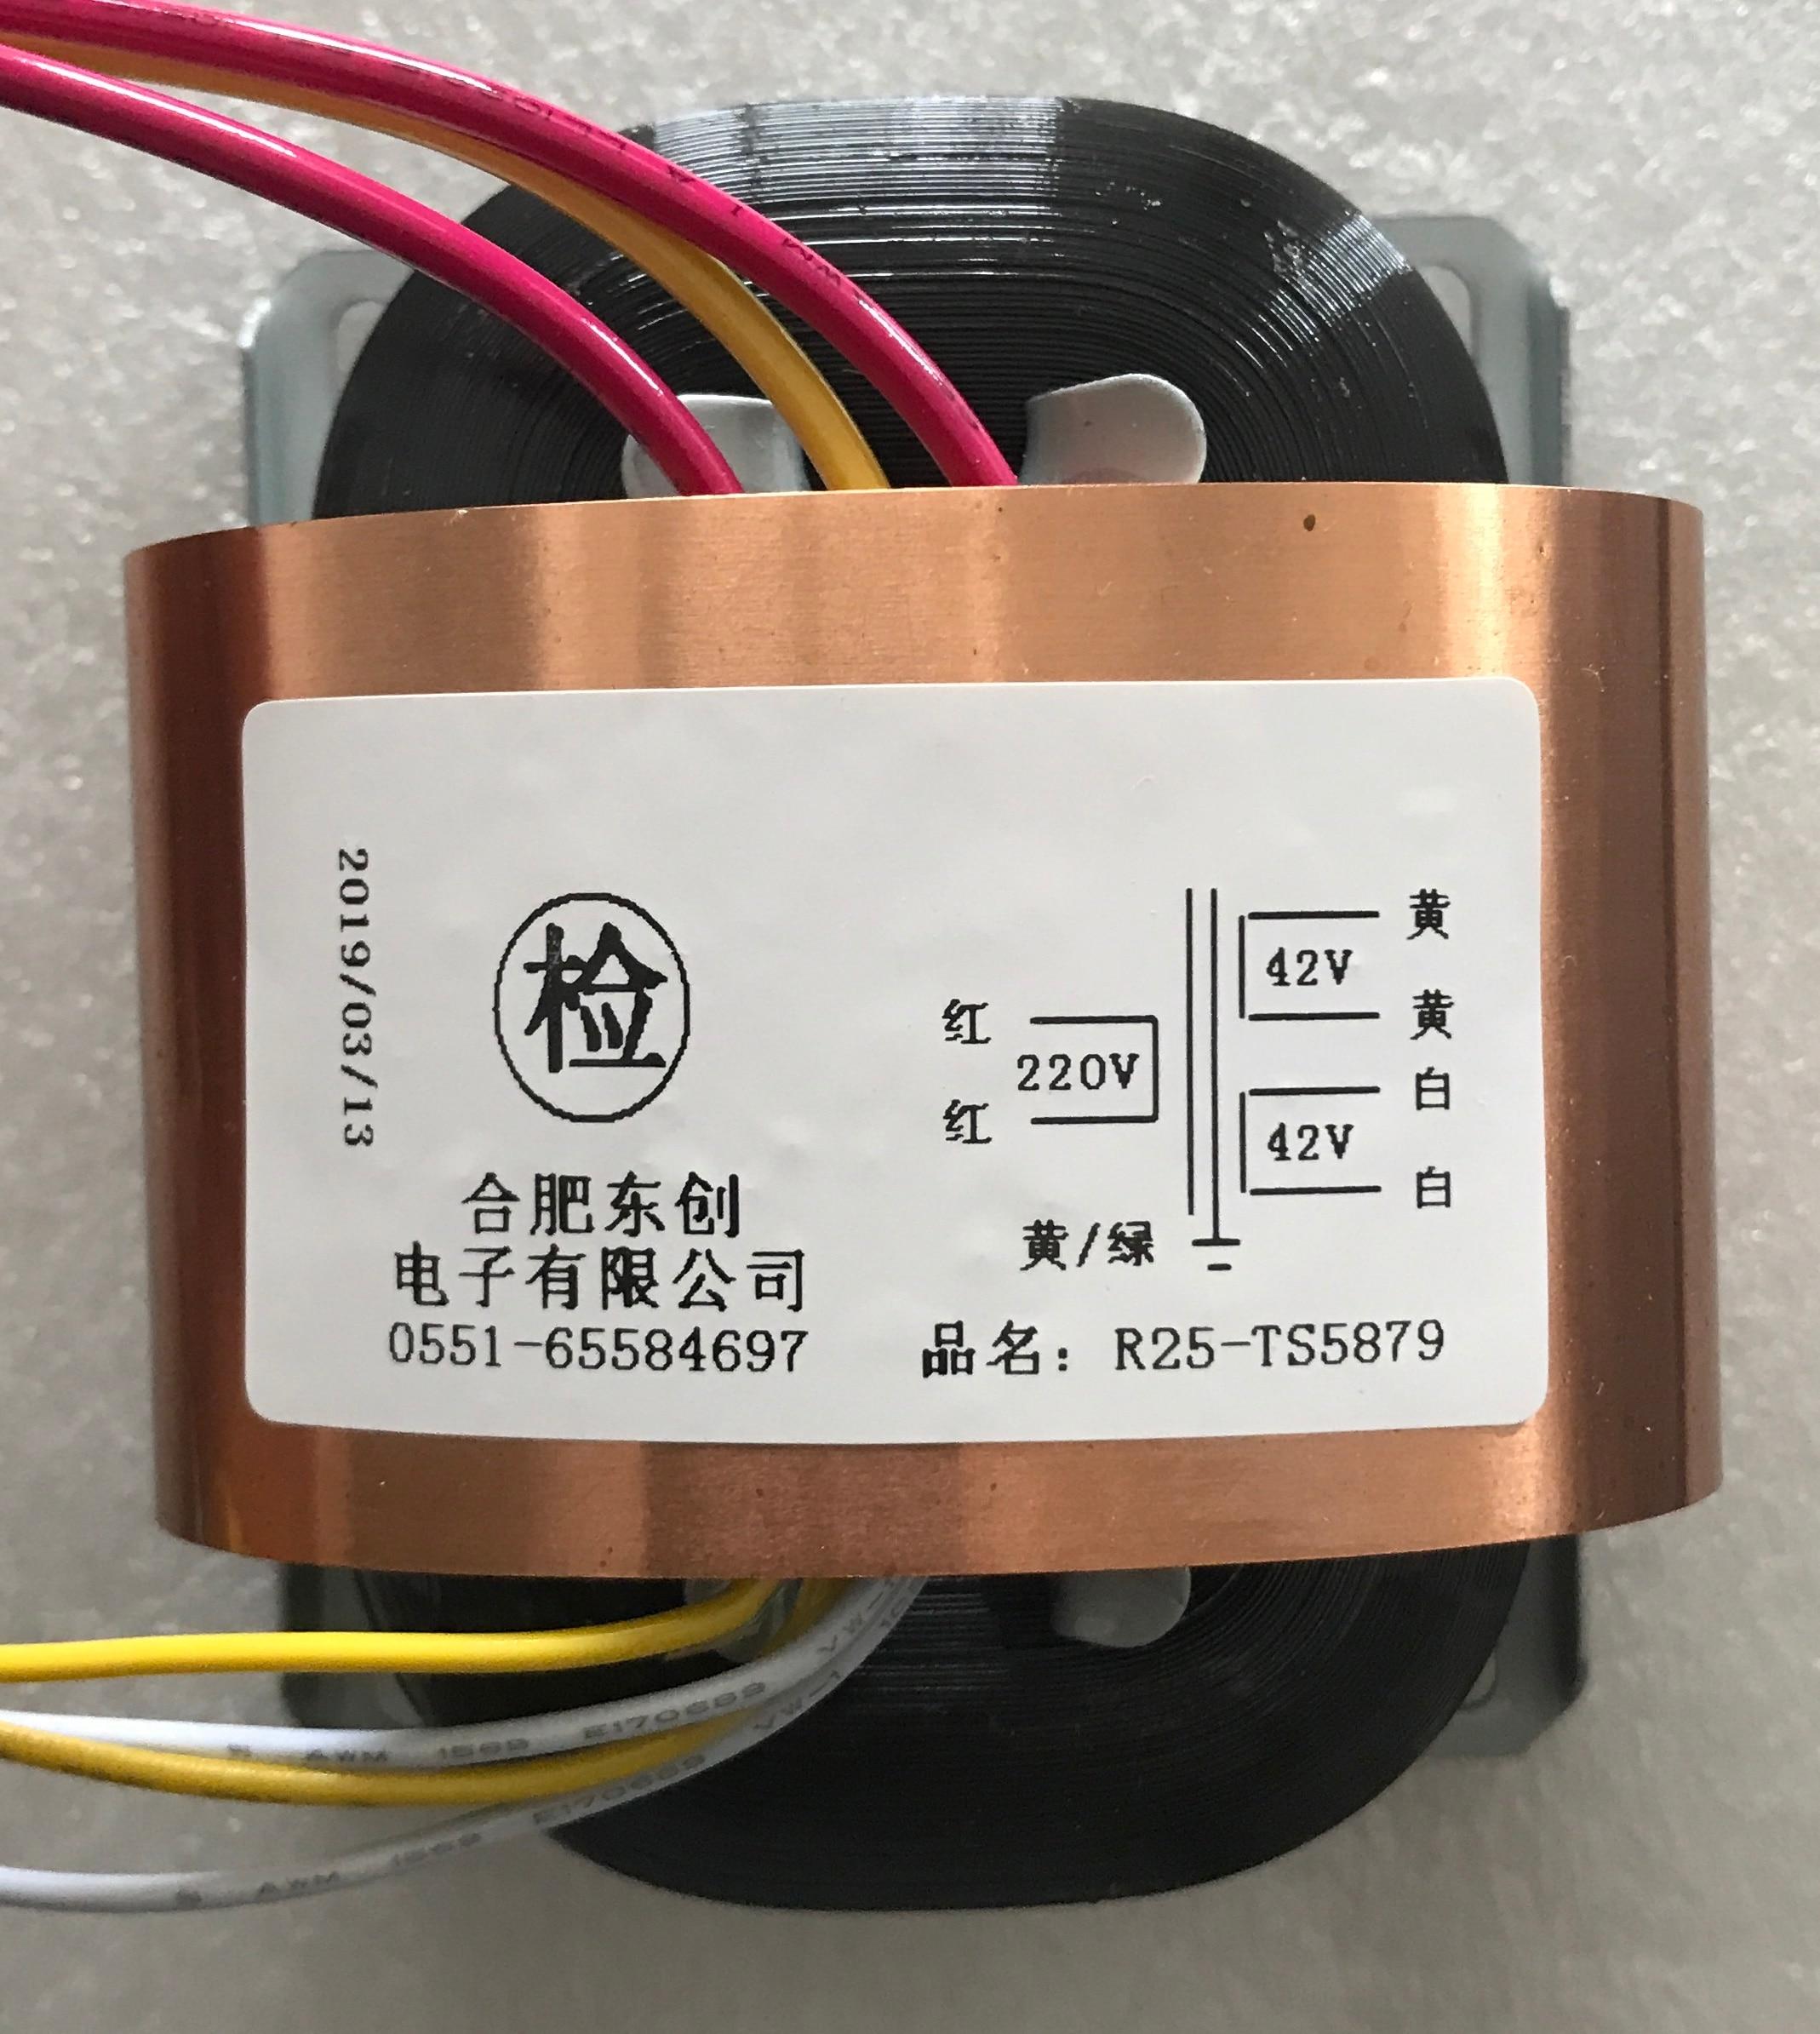 2*42V Transformer R Core R25 custom transformer 220V with copper shield for Pre-decoder power supply2*42V Transformer R Core R25 custom transformer 220V with copper shield for Pre-decoder power supply